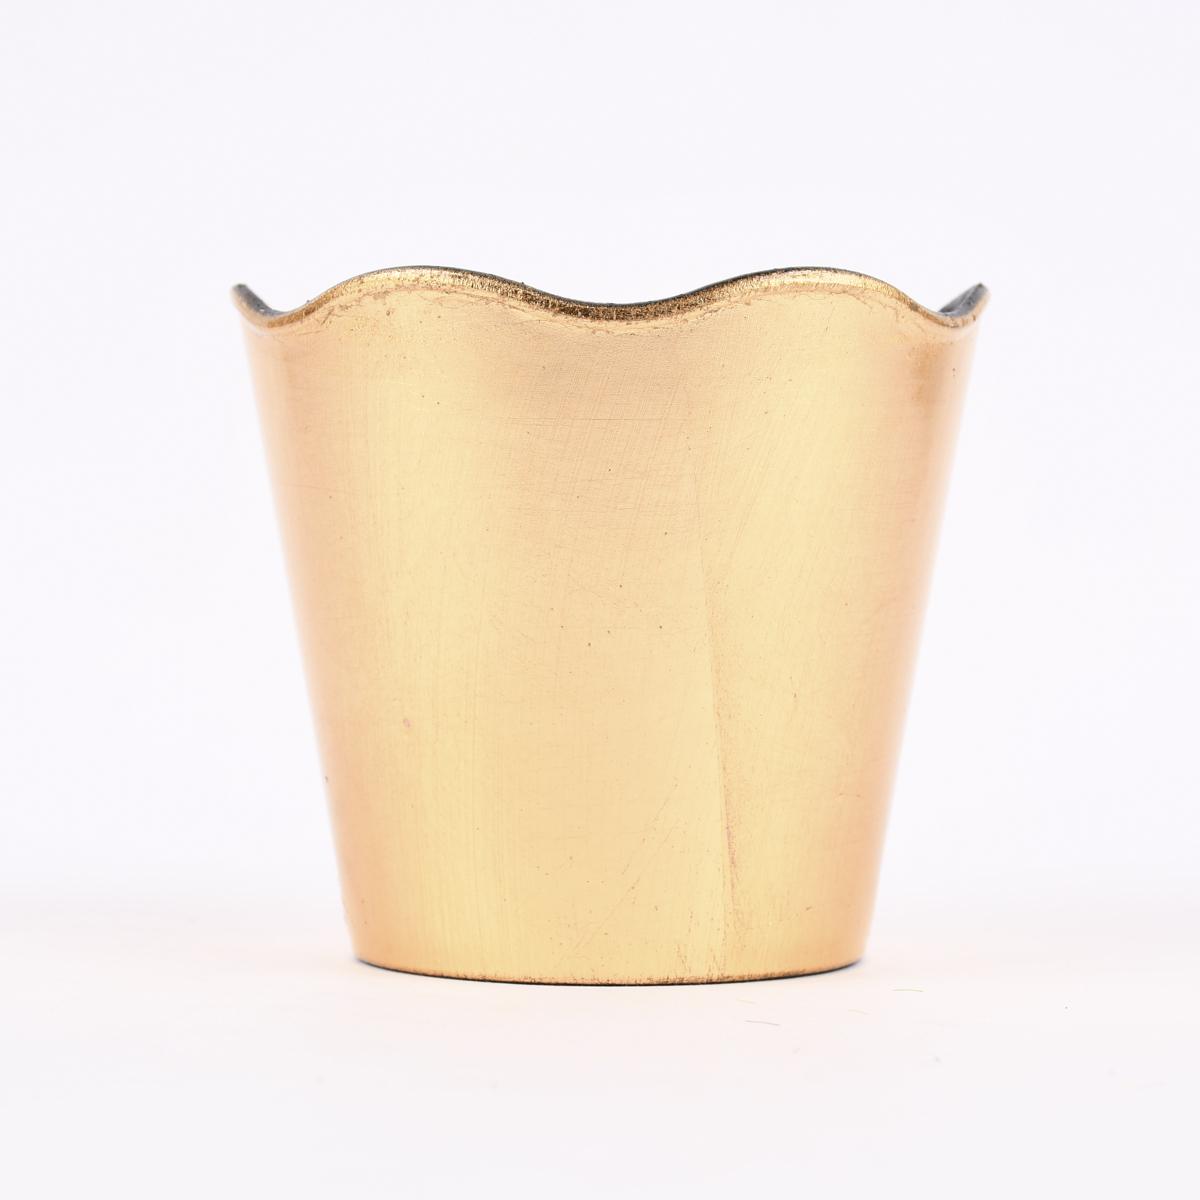 Übertopf mit gewelltem Rand Kunststoff goldfarbig 14x13cm